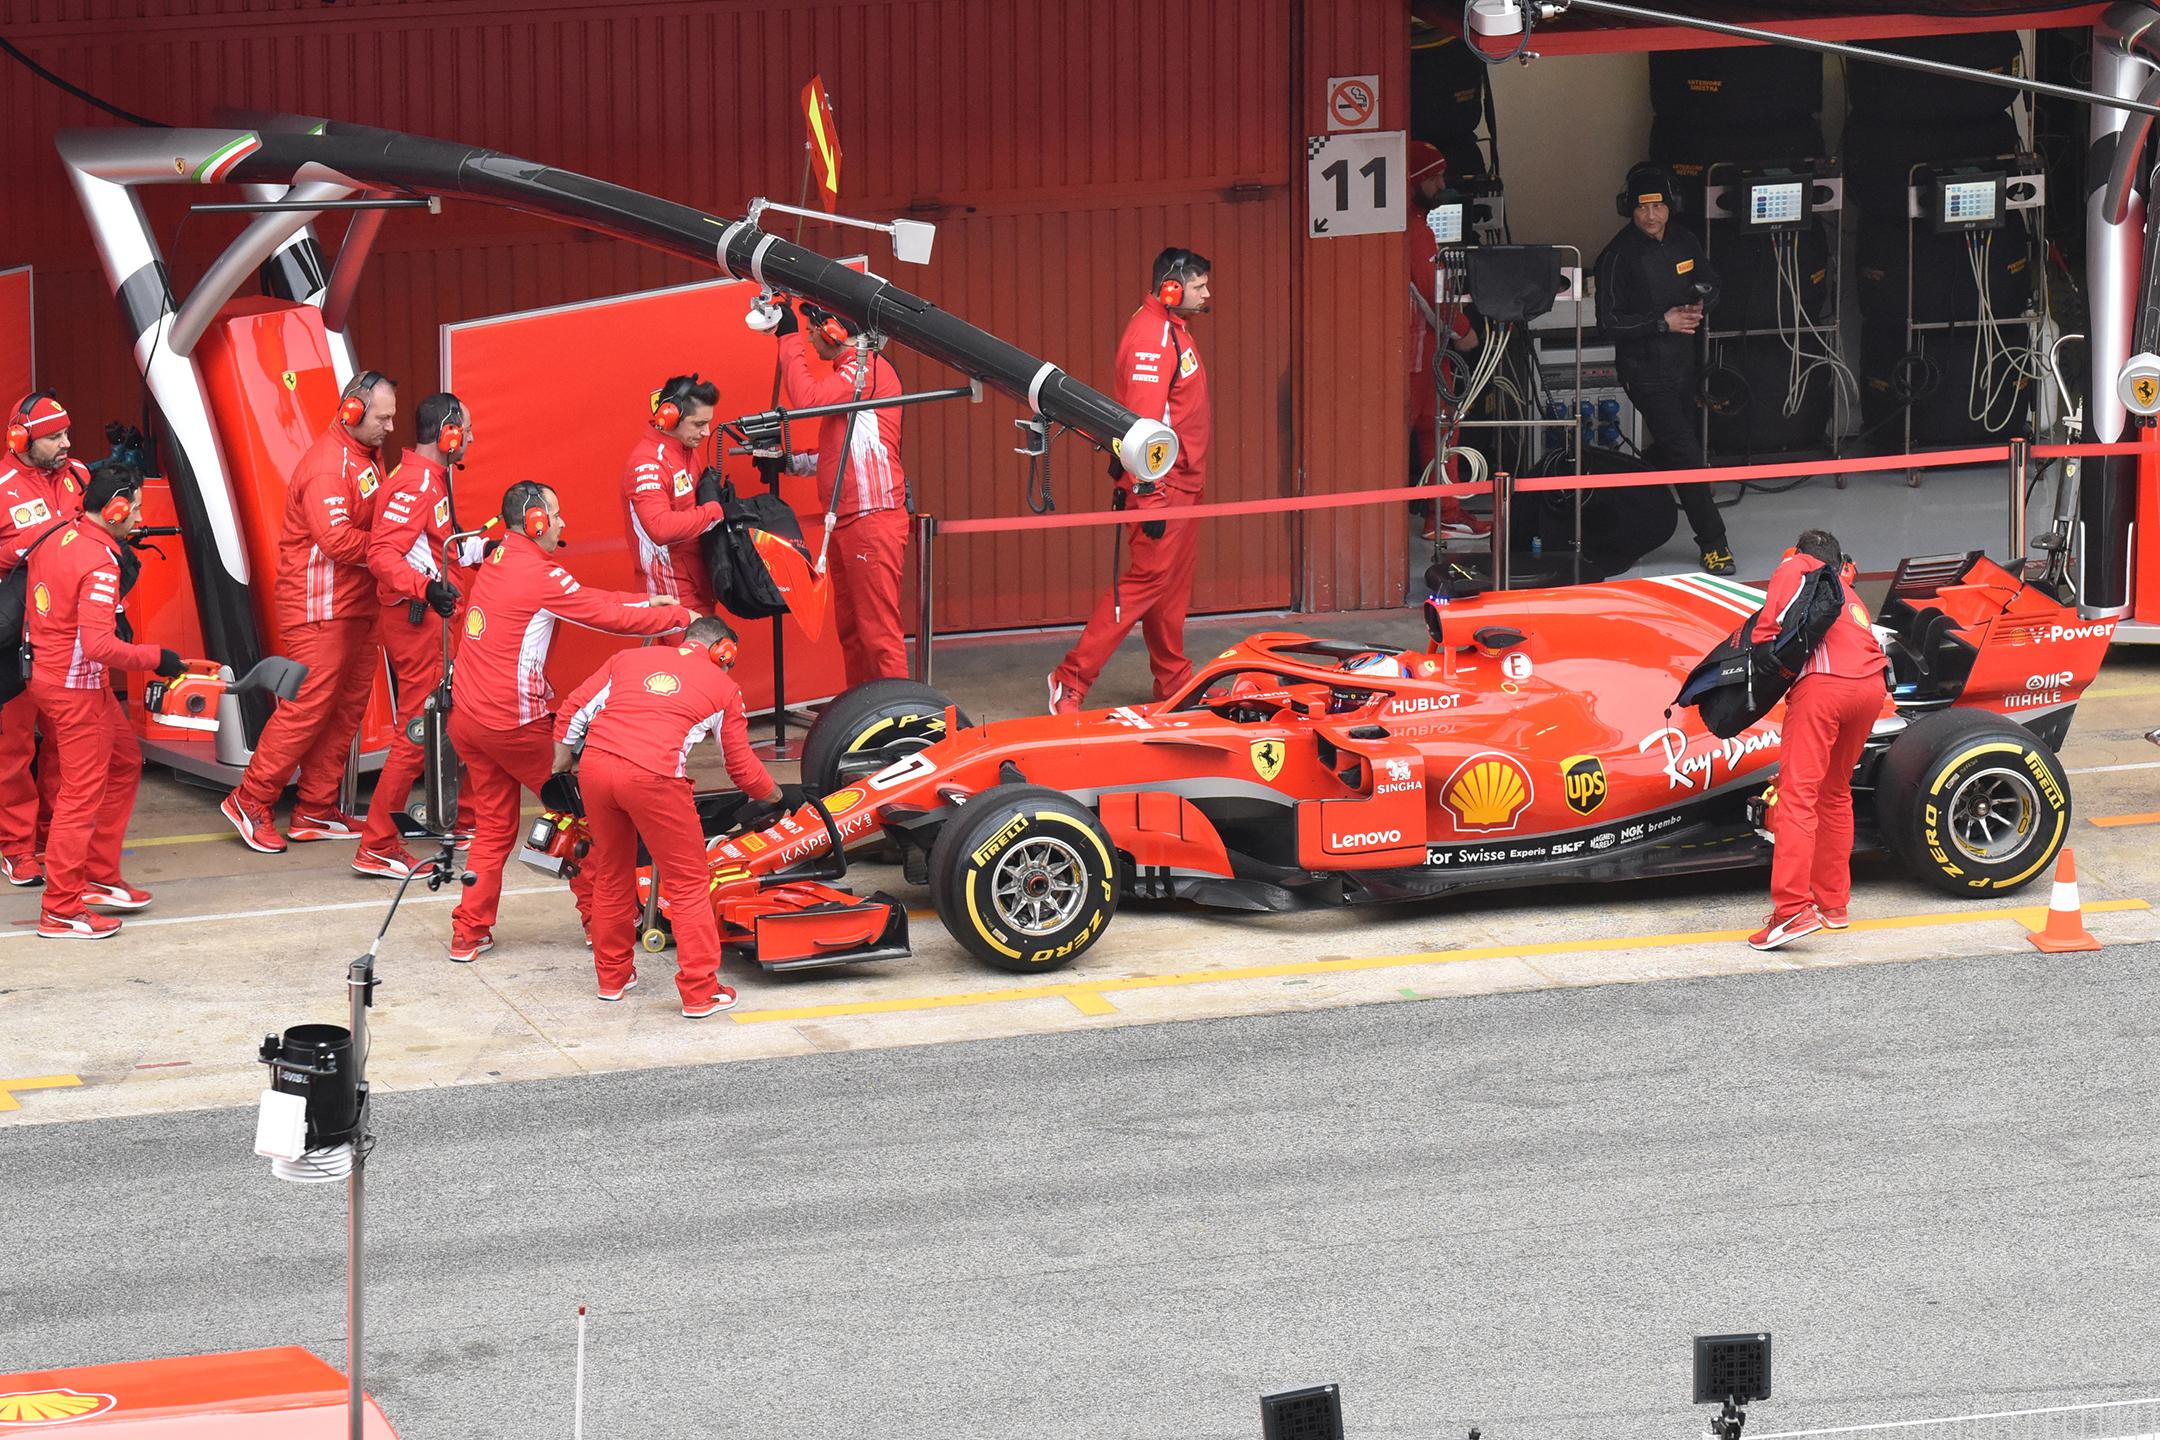 Scuderia Ferrari SF71H - pitlane - F1 Testing - 2018 - photo by Jacques Denis - Team DESIGNMOTEUR